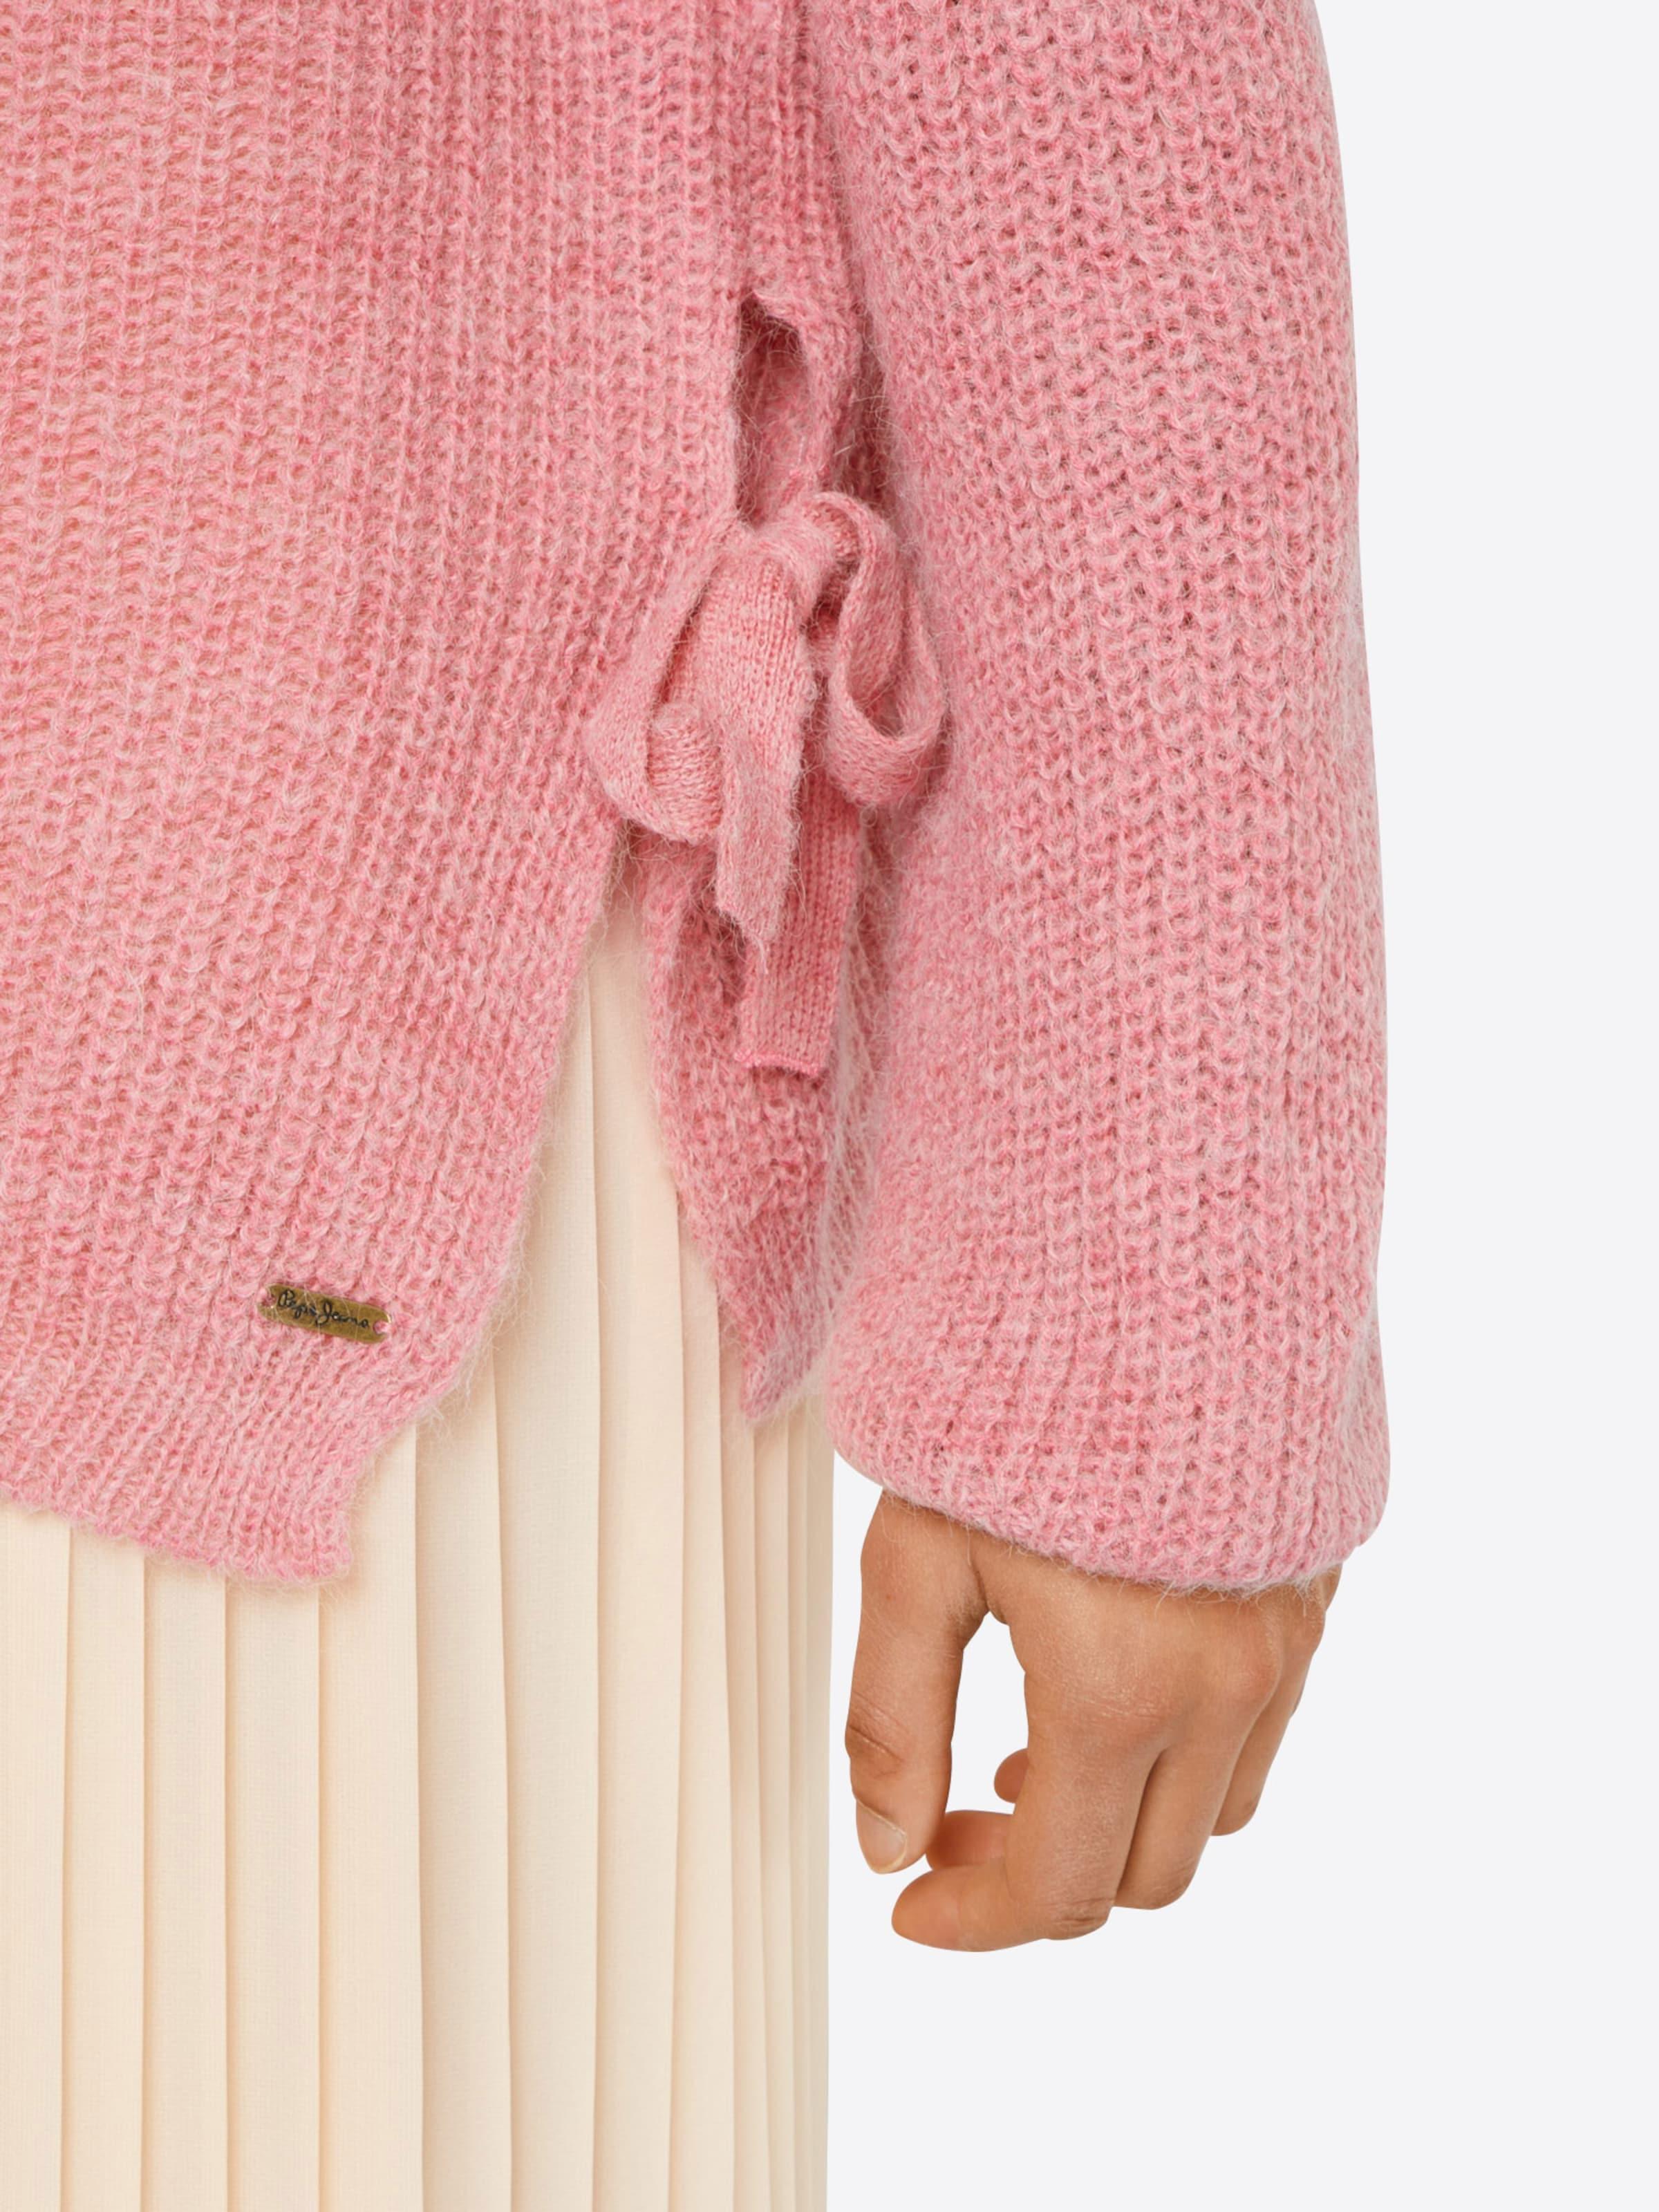 Pepe Strickpullover 'BOSSA' Jeans Strickpullover Jeans 'BOSSA' Strickpullover Pepe Jeans 'BOSSA' Pepe 4Ffw1q0